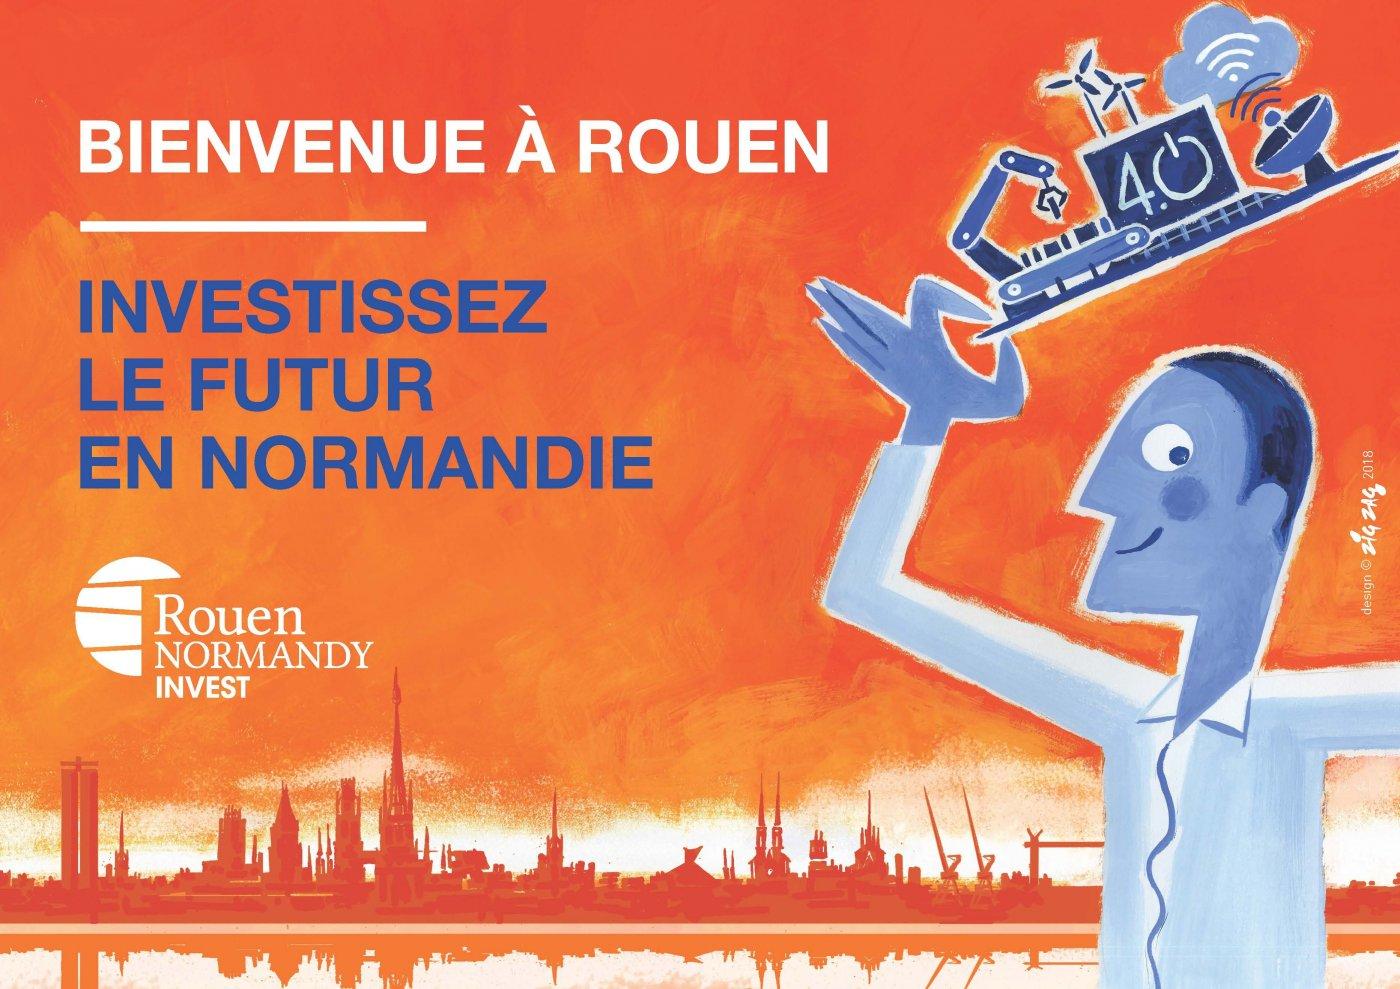 rouen-normandie-invest-a-rouen